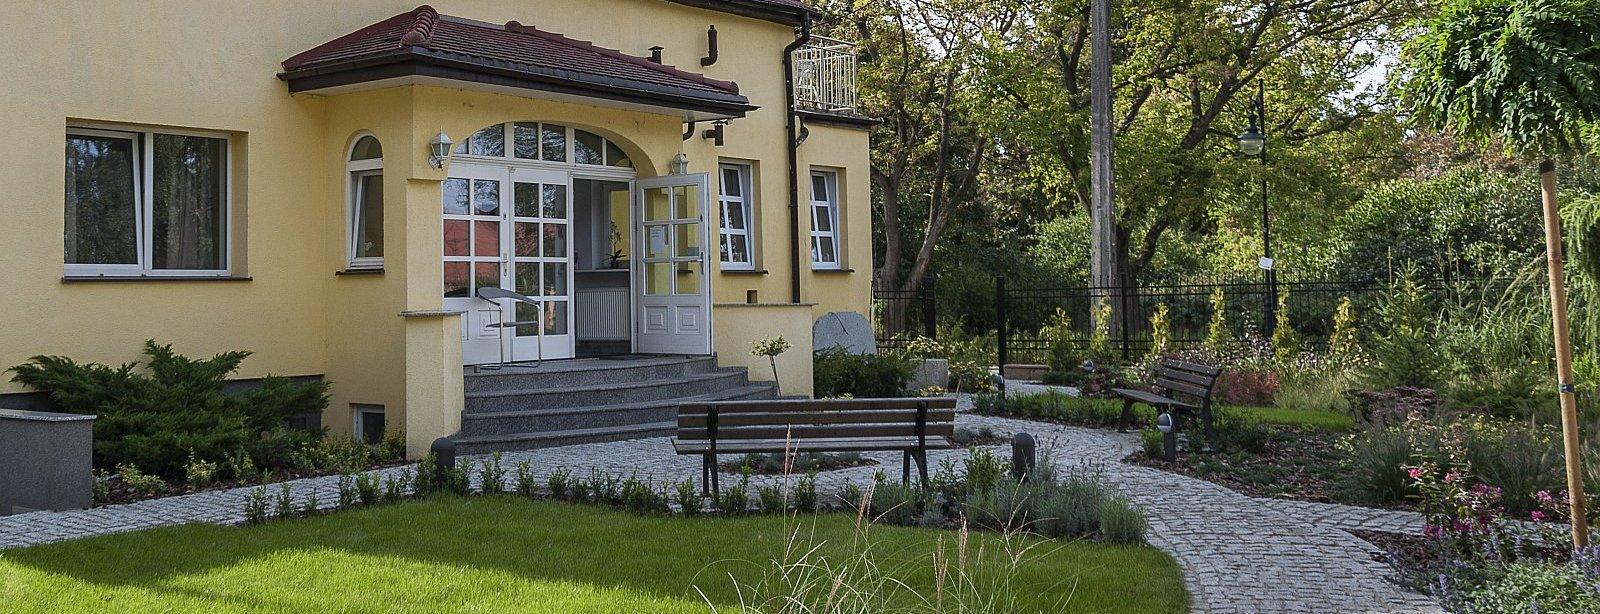 zlota-plaza-kwatery-nad-morzem-gdansk-jelitkowo_ad024207b-web